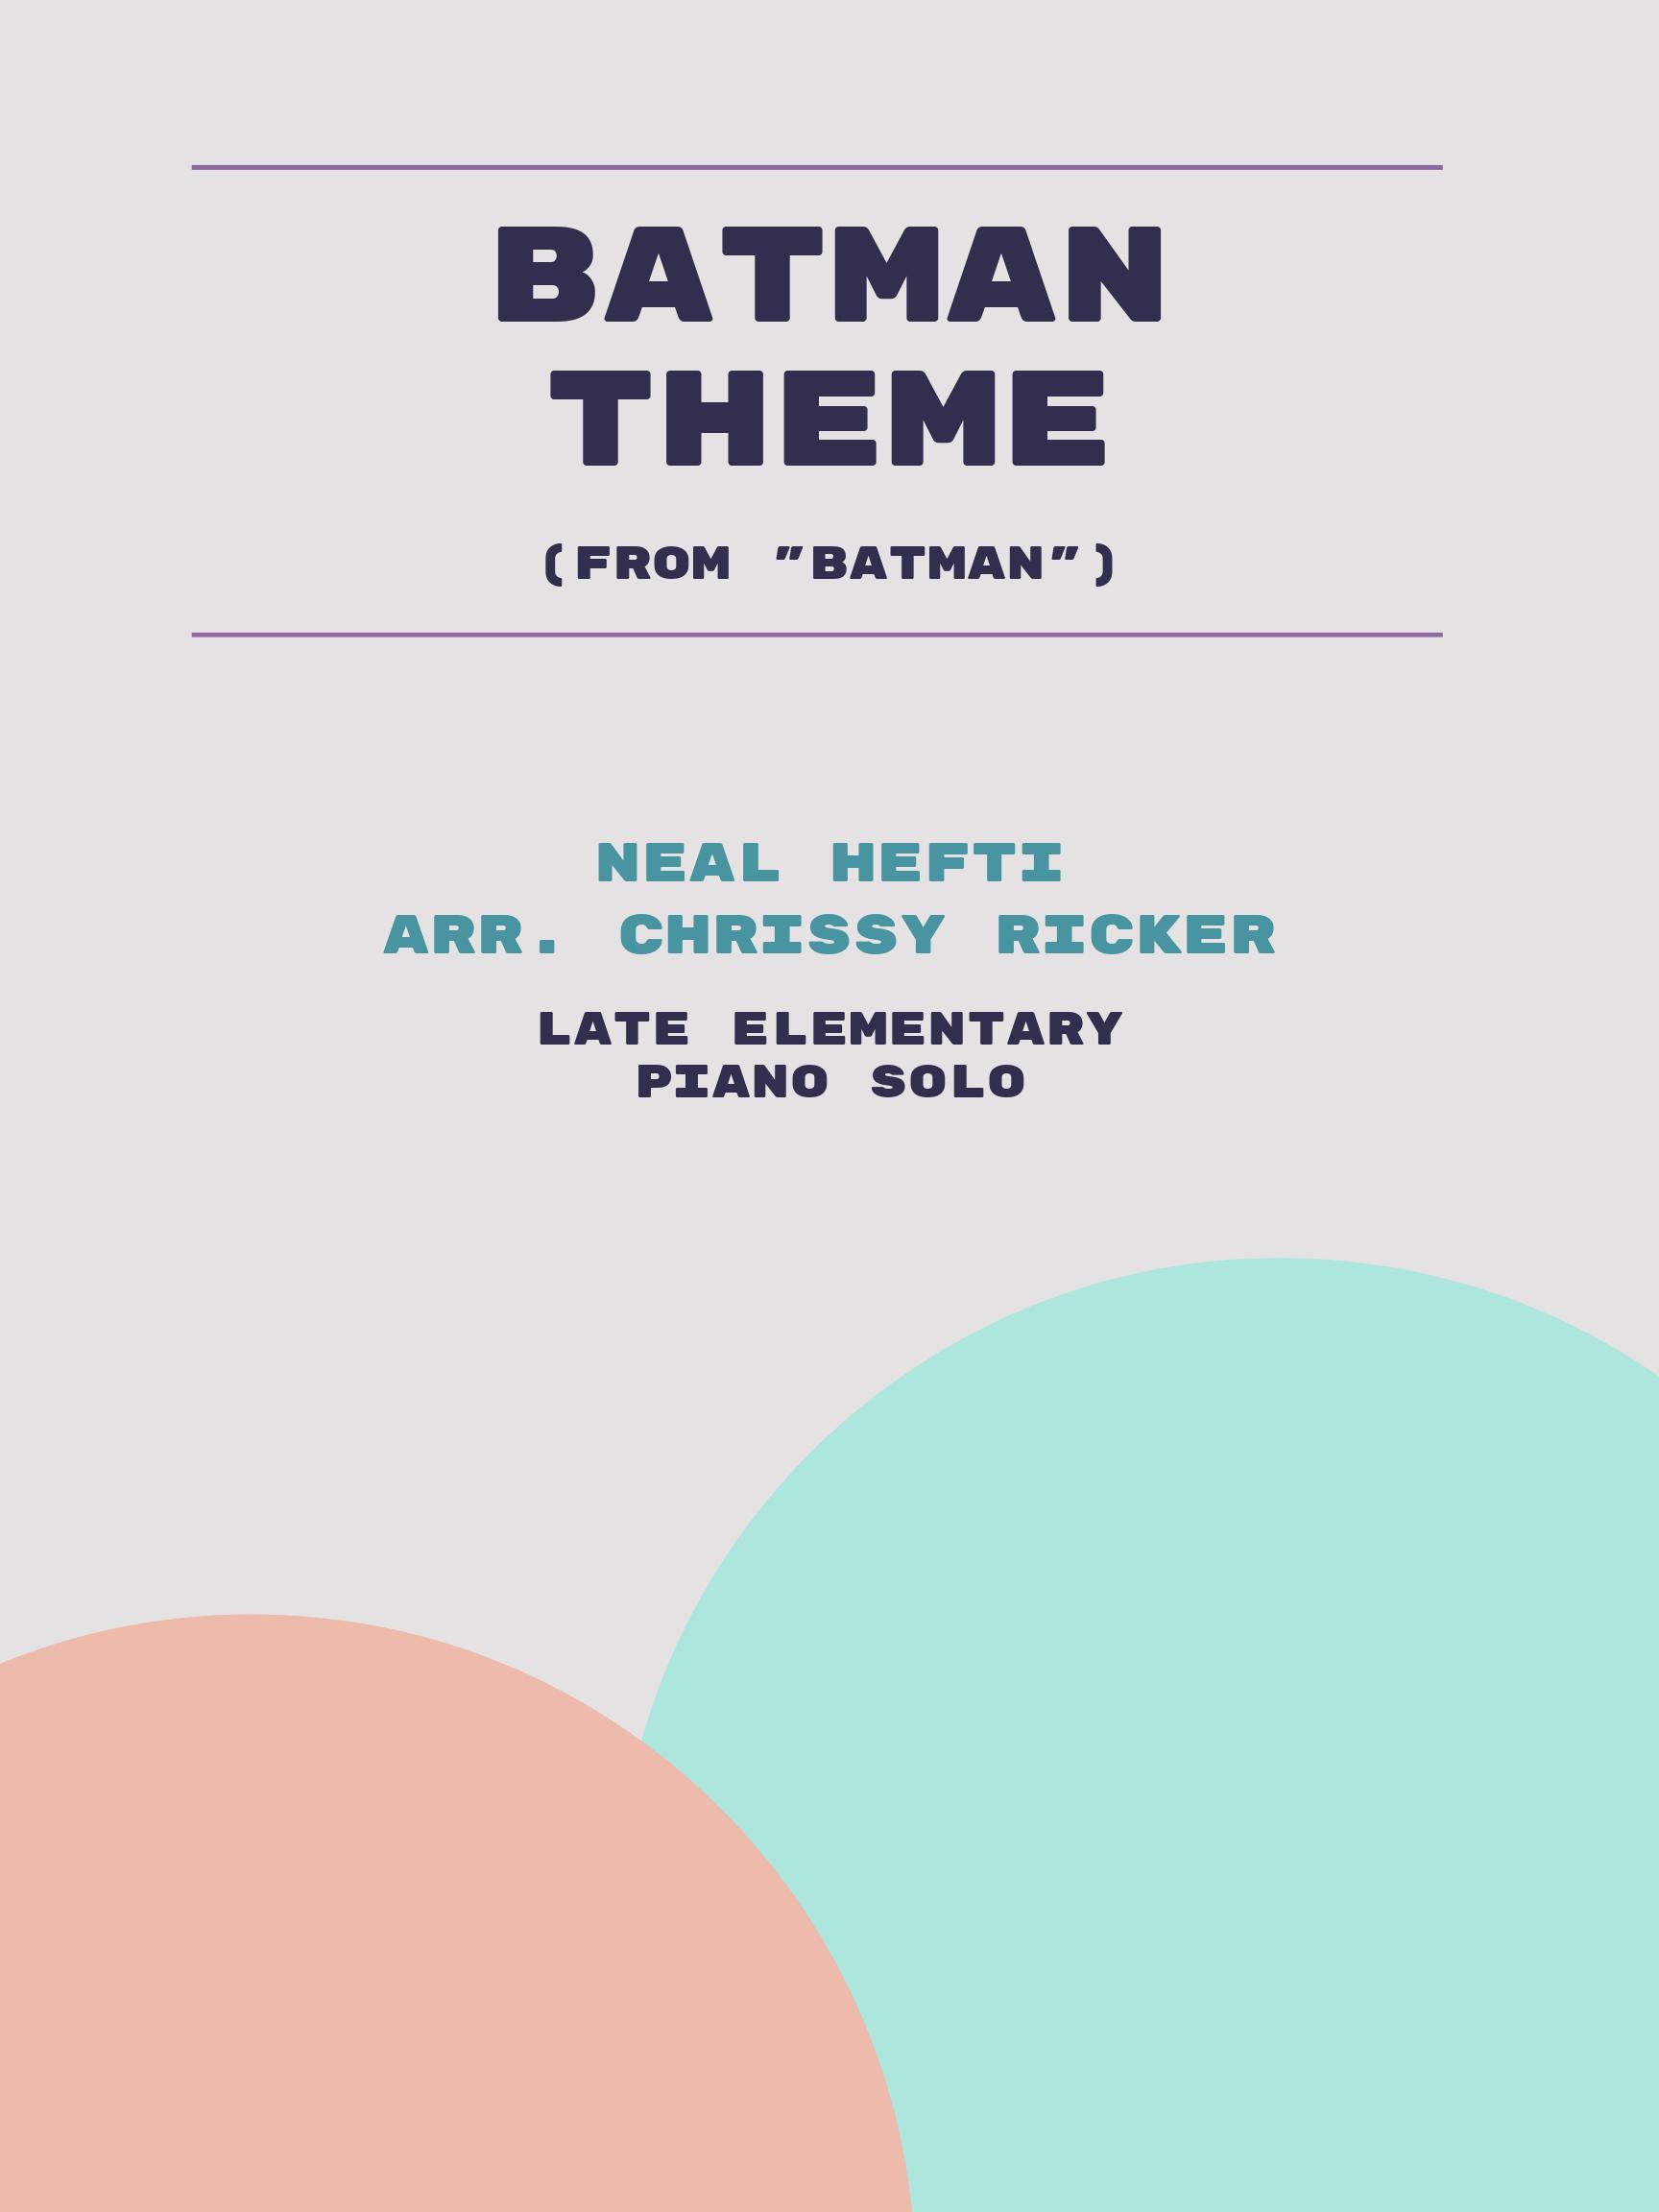 Batman Theme by Neal Hefti